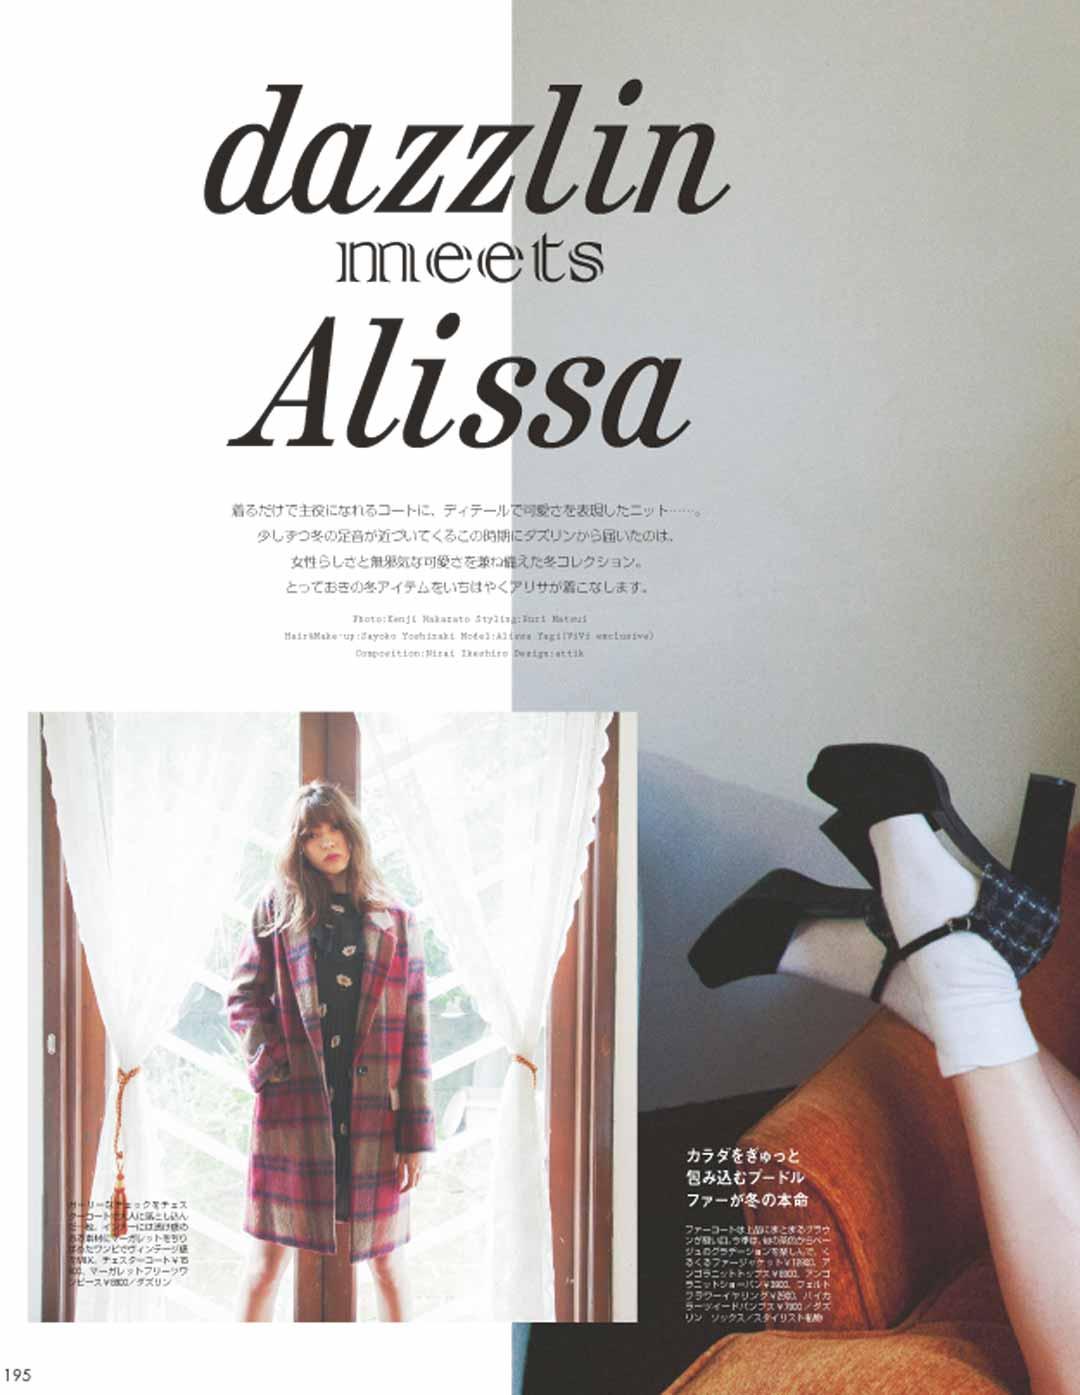 ViVi 12月号P.195『dazzlin[ダズリン] meets Alissa』掲載